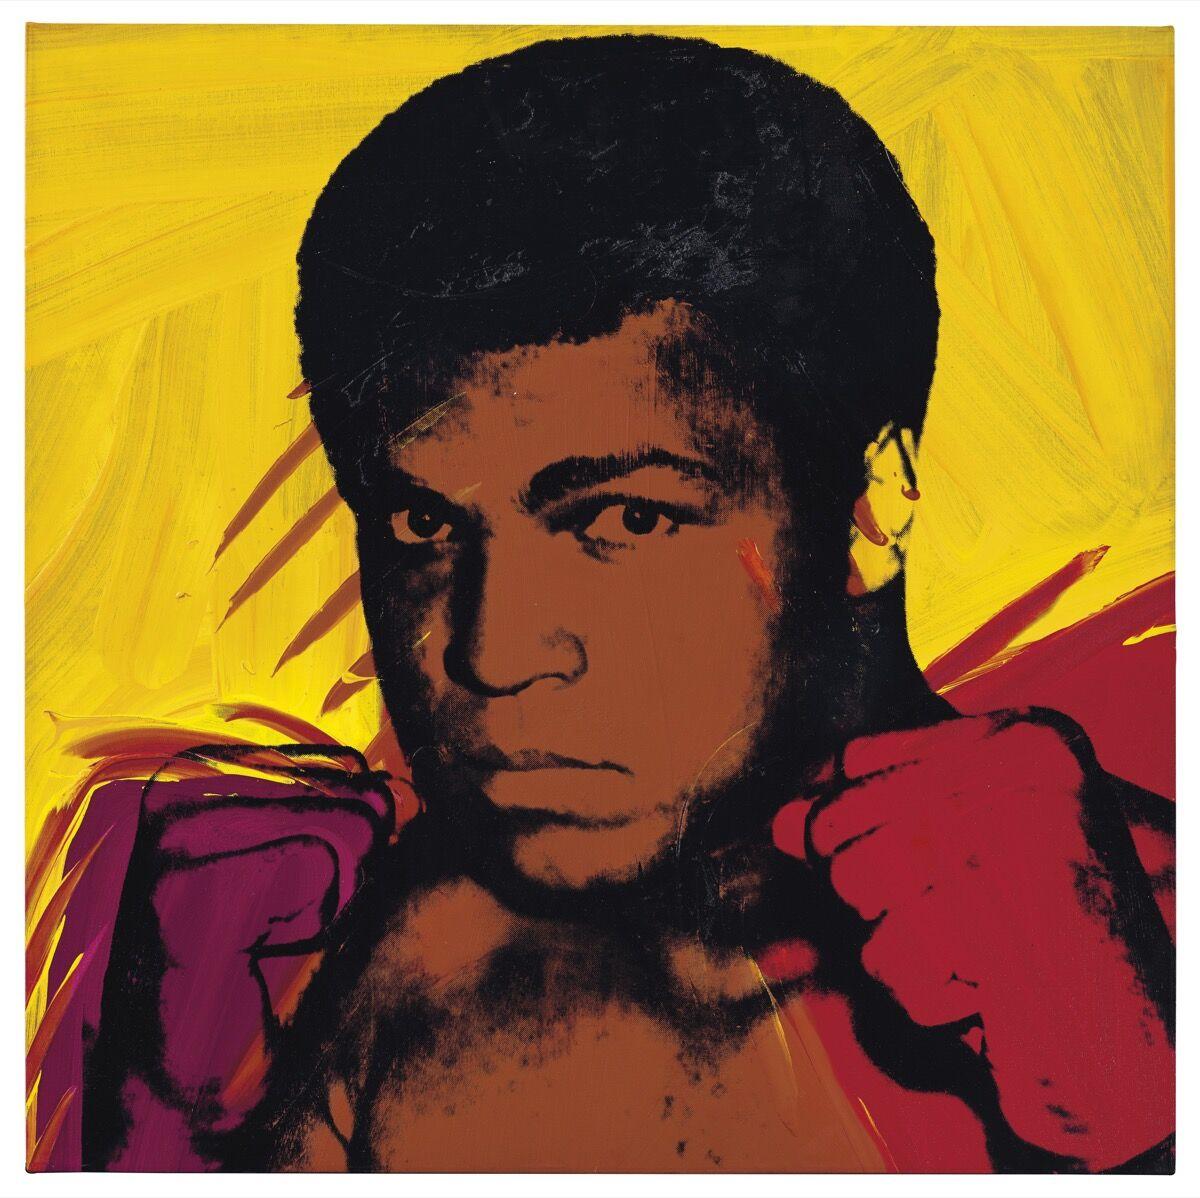 Andy Warhol, Muhammad Ali, 1977. Courtesy of Christie's.